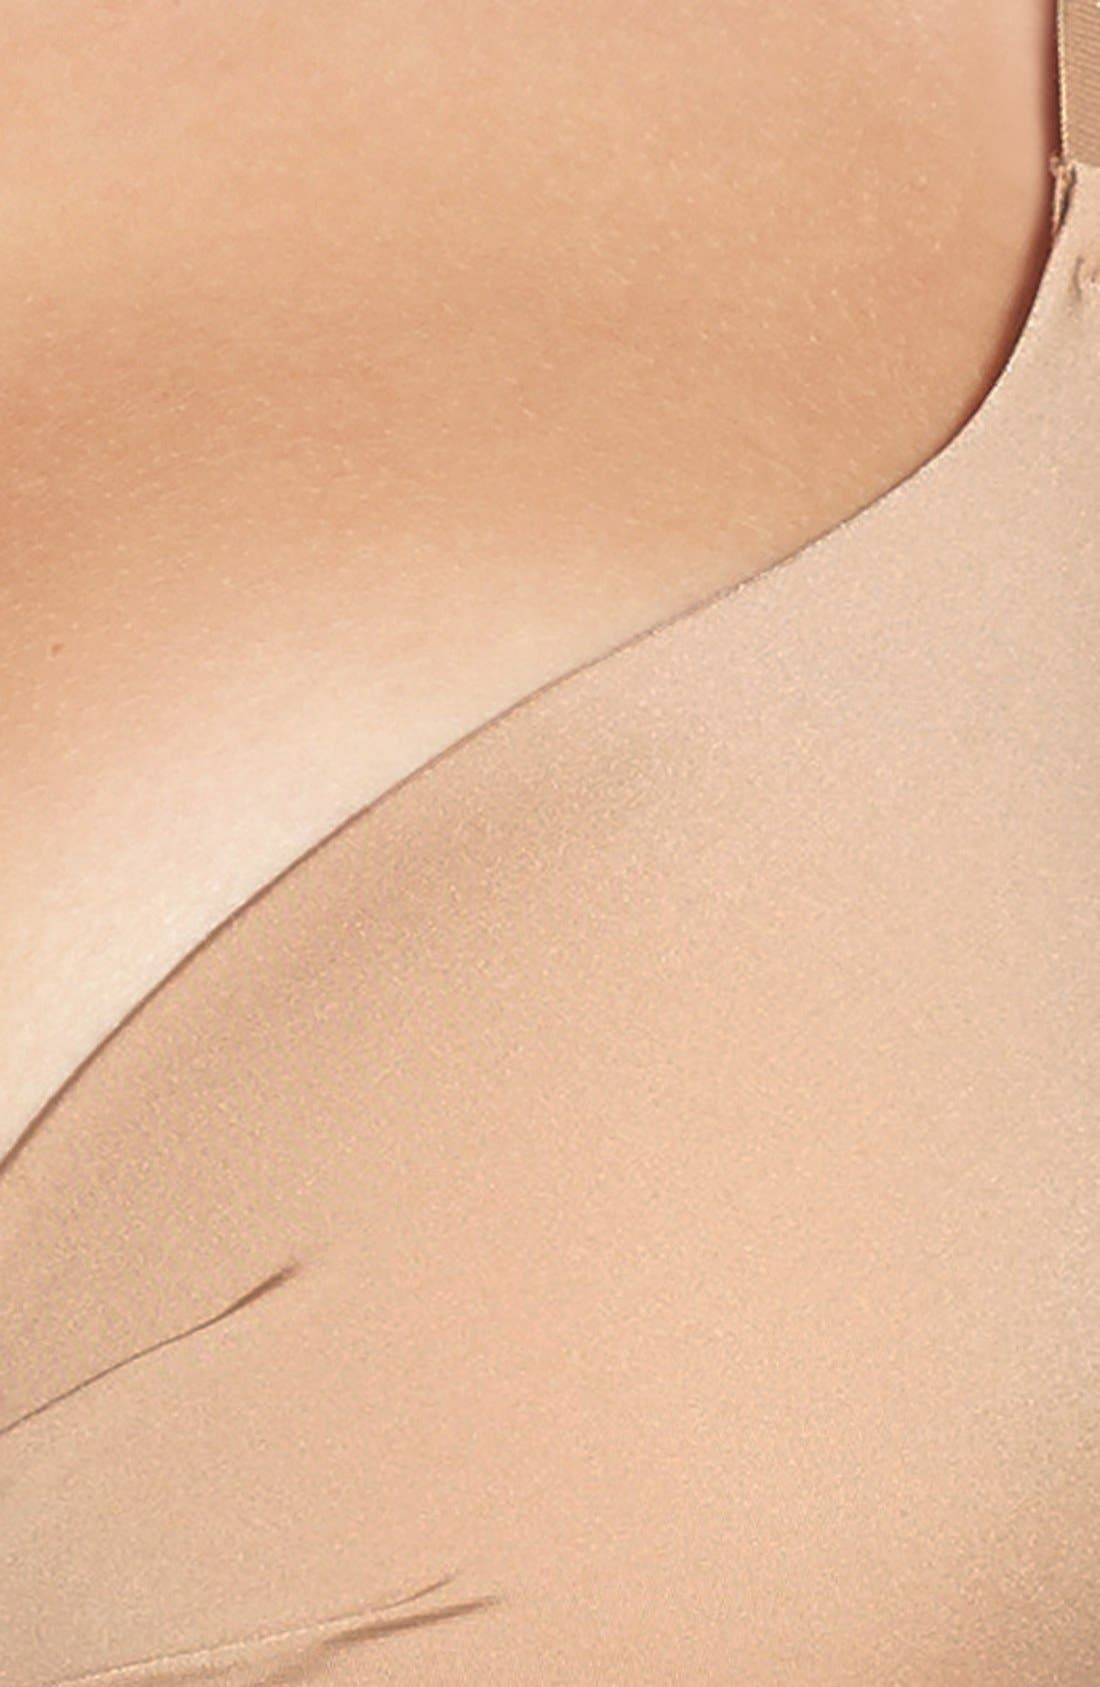 Alternate Image 3  - DKNY 'Perfect Profile' Underwire T-Shirt Bra